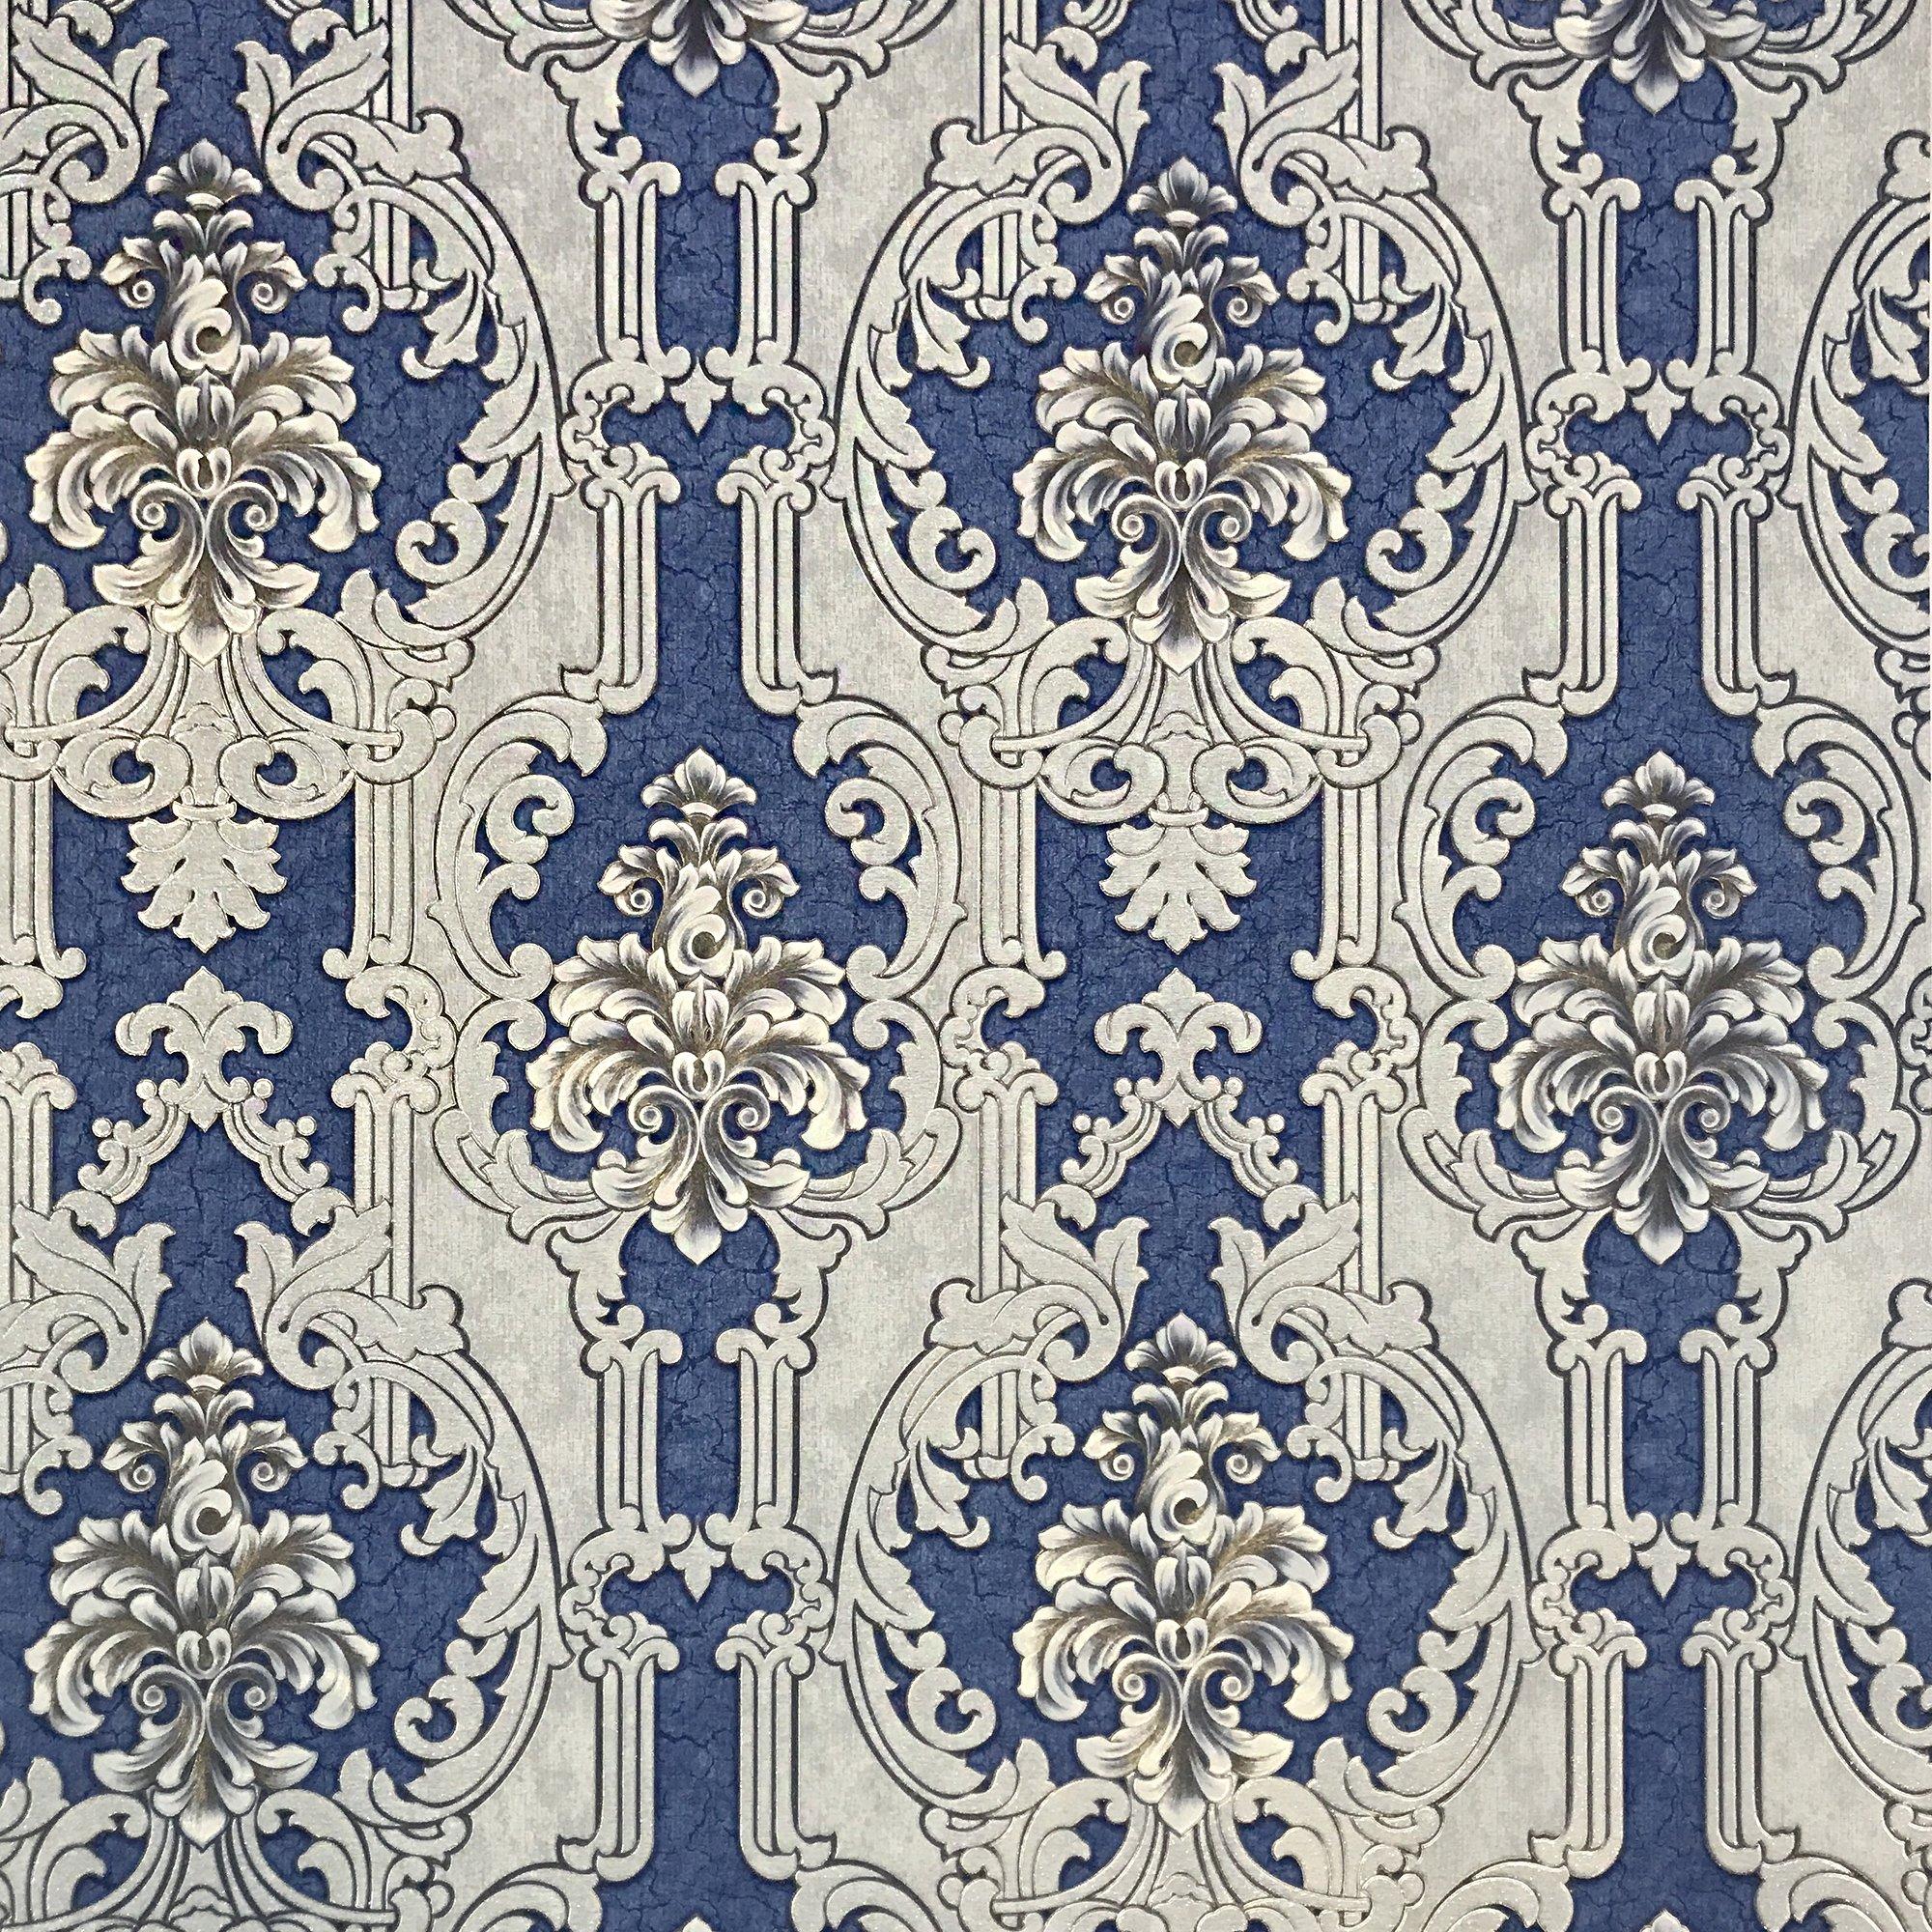 113.52sq.ft rolls paste the wall only Embossed Slavyanski wallcoverings vintage victorian damask pattern Vinyl Non-Woven Wallpaper silver blue bronze metallic grey textured gold glitters modern design